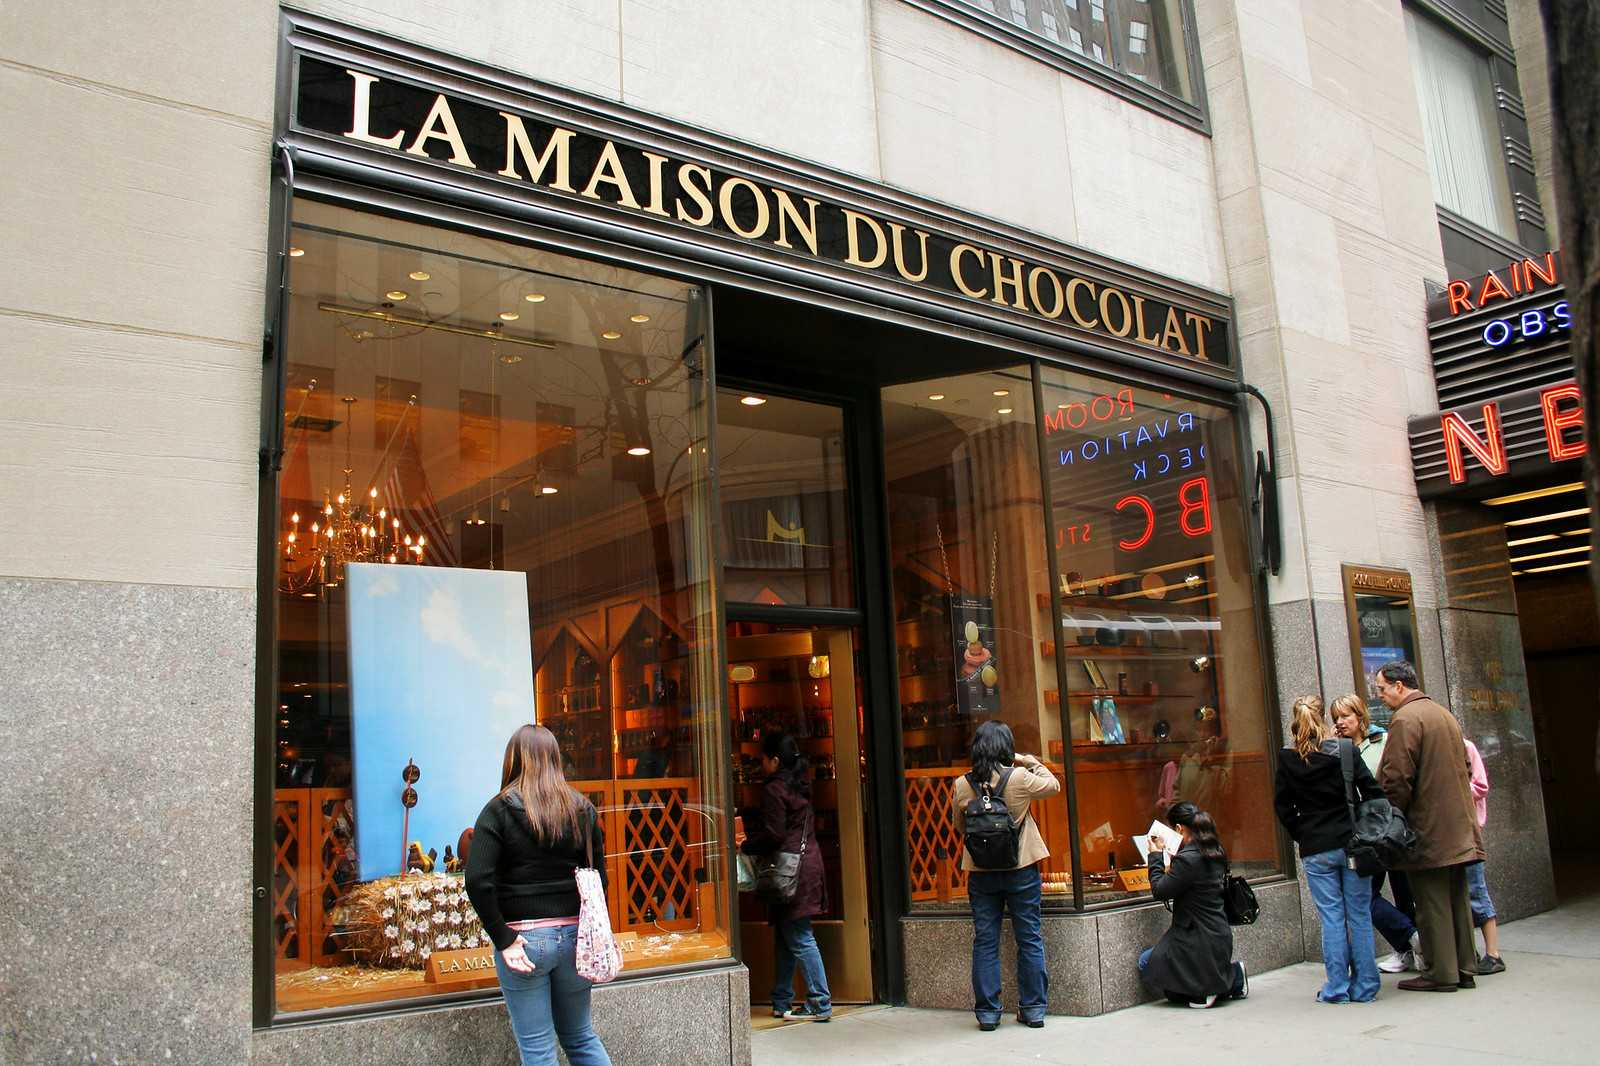 магазин шоколада Ле Маисон Дю Нью–Йорк